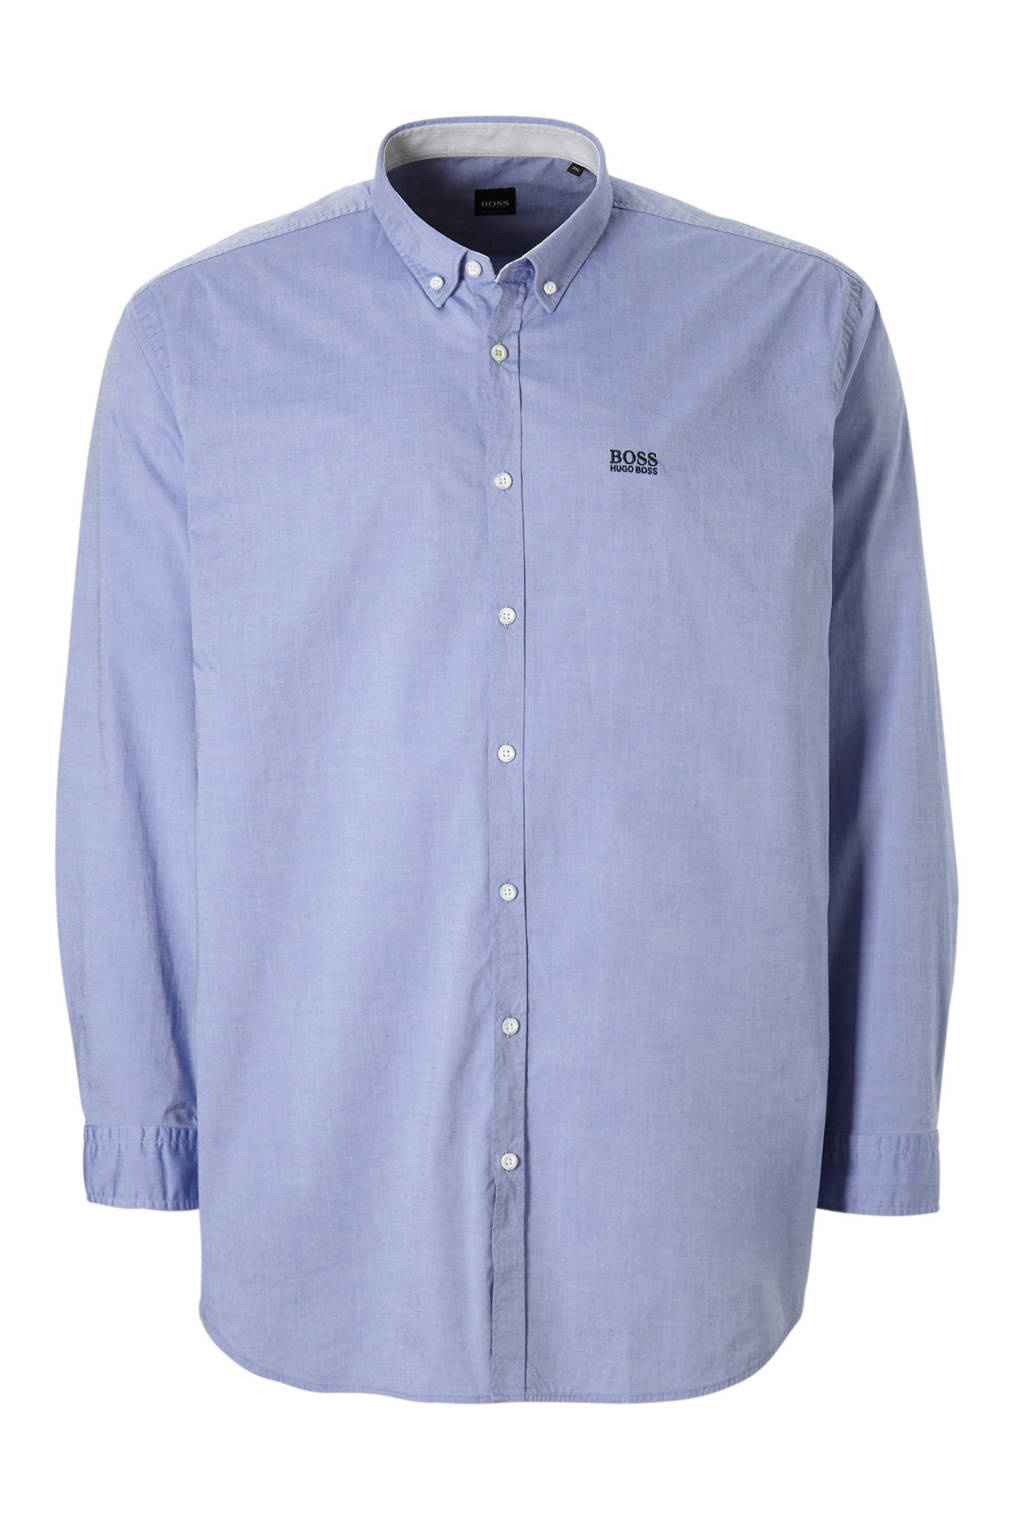 Boss Athleisure Big & Tall overhemd, Blauw